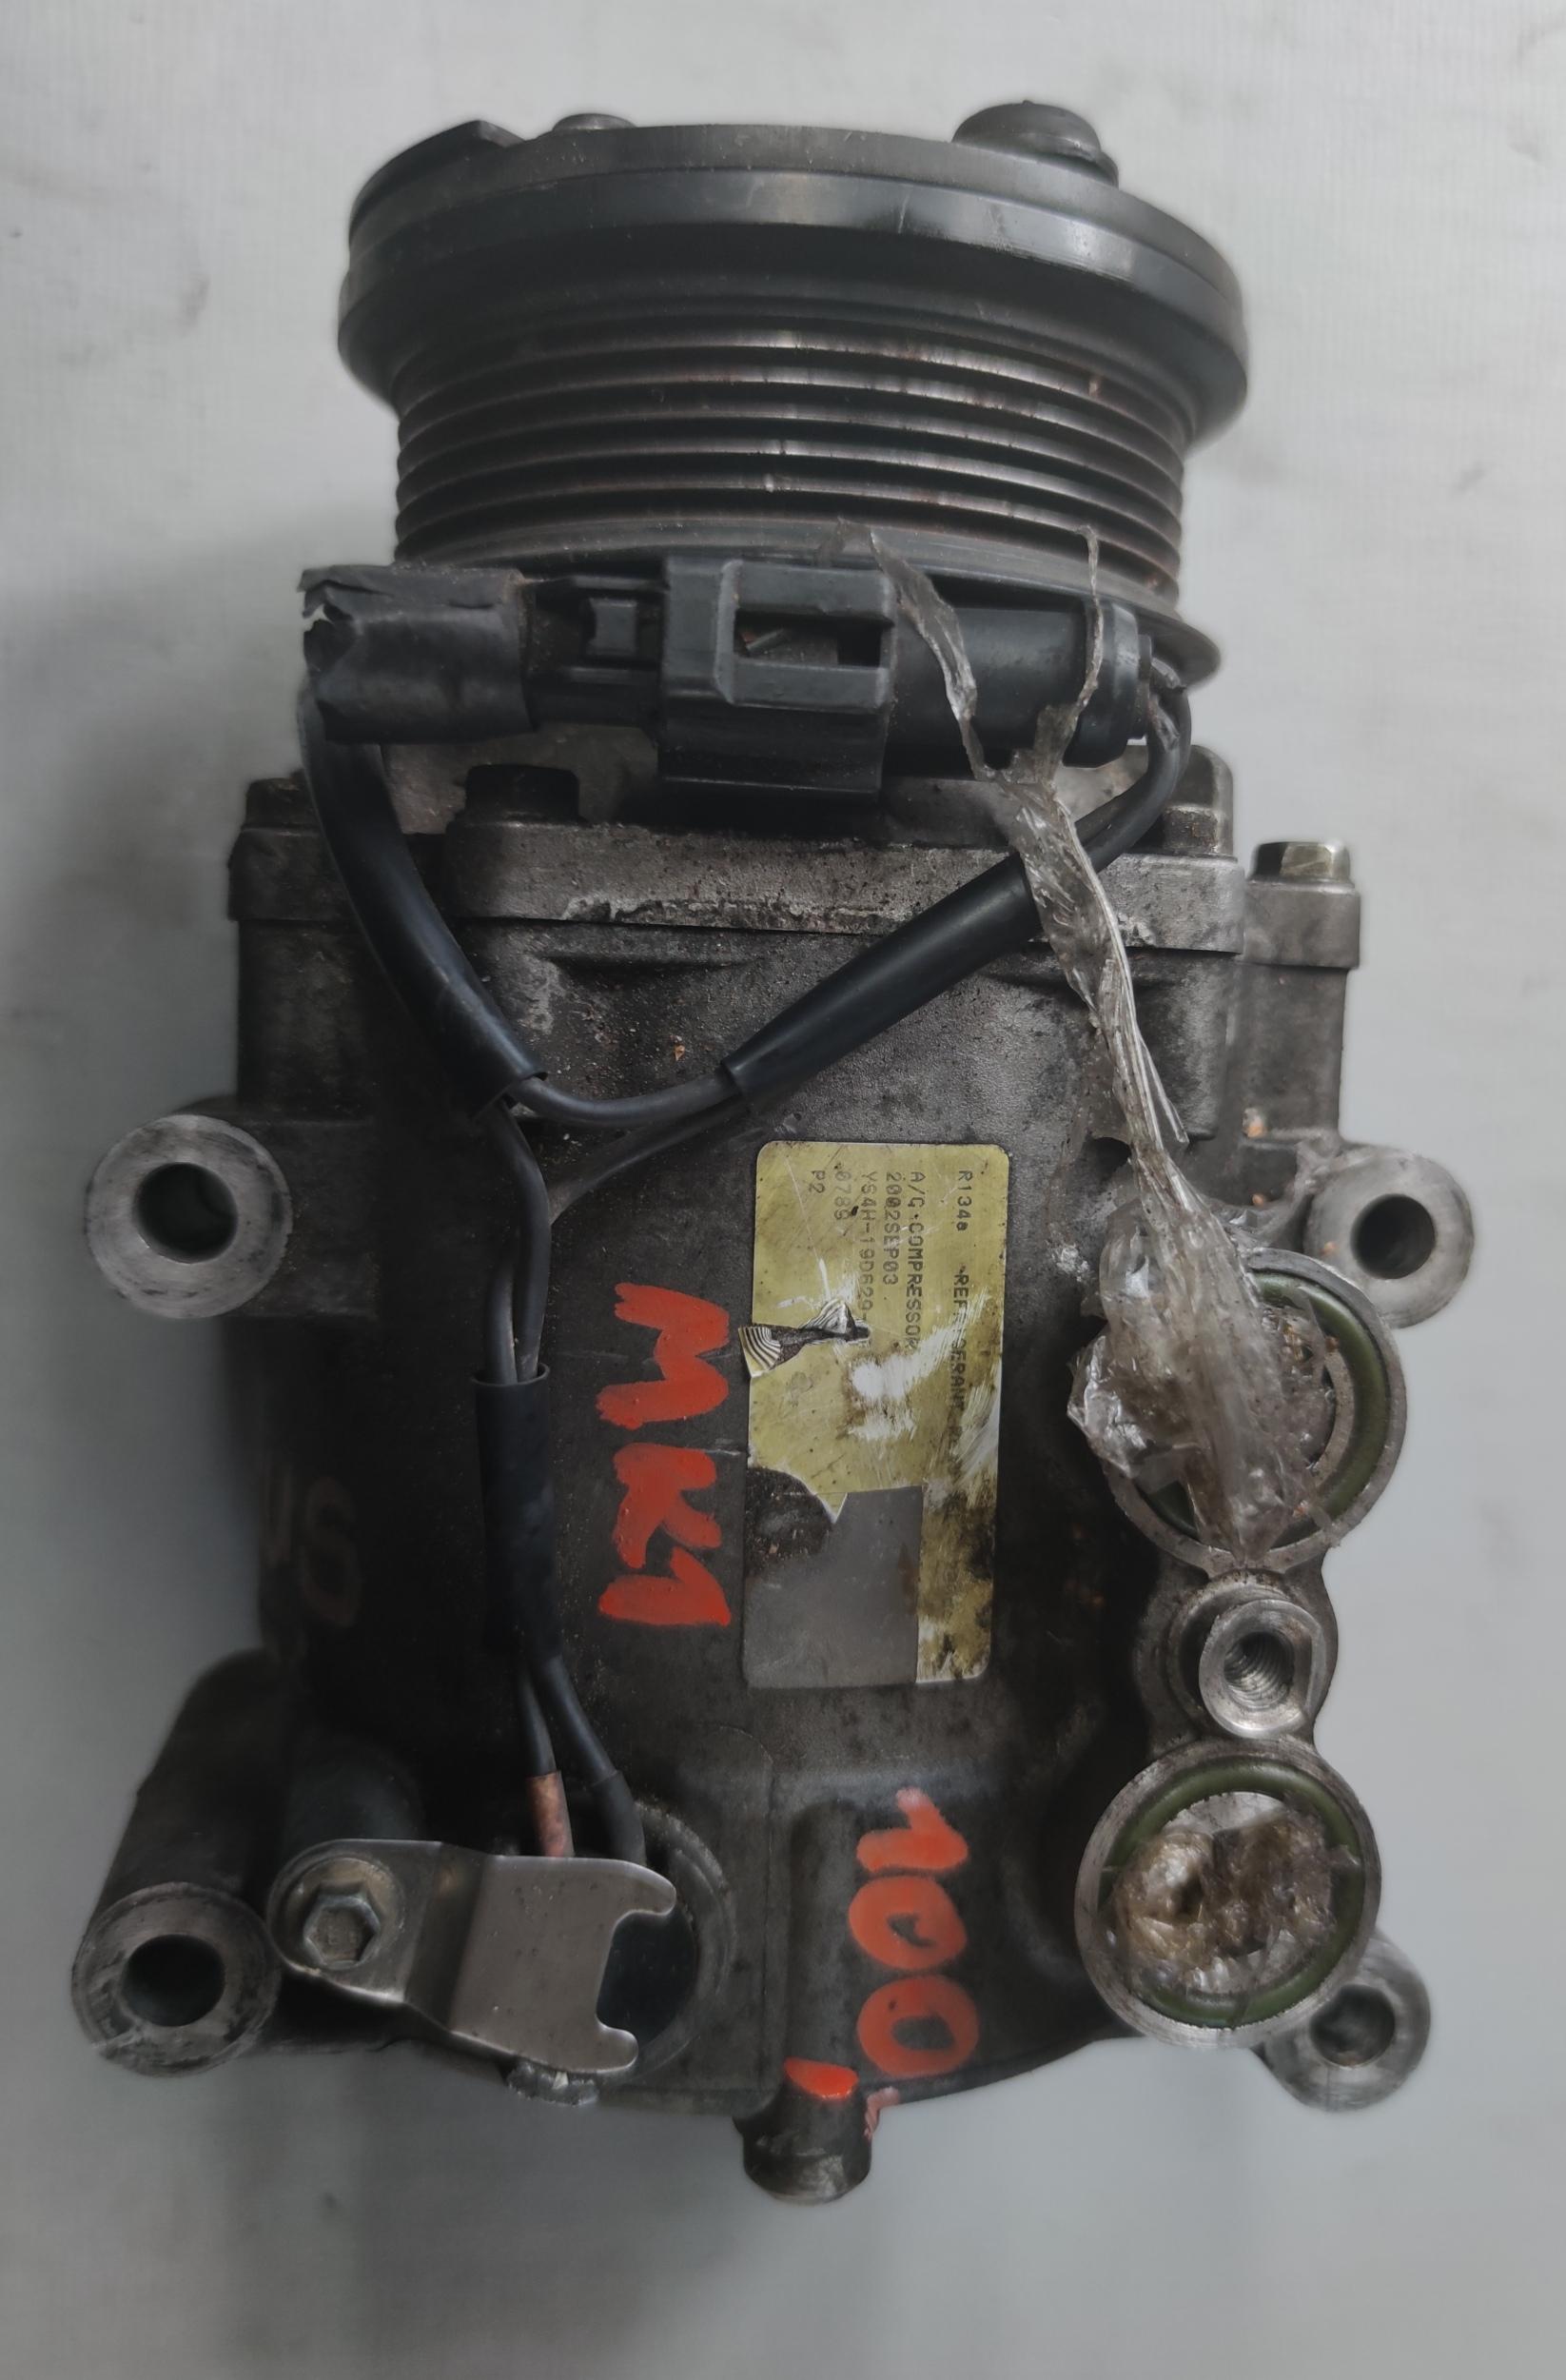 Sprężarka Kilmatyzacji Ford Focus ys4h-19d629-ab